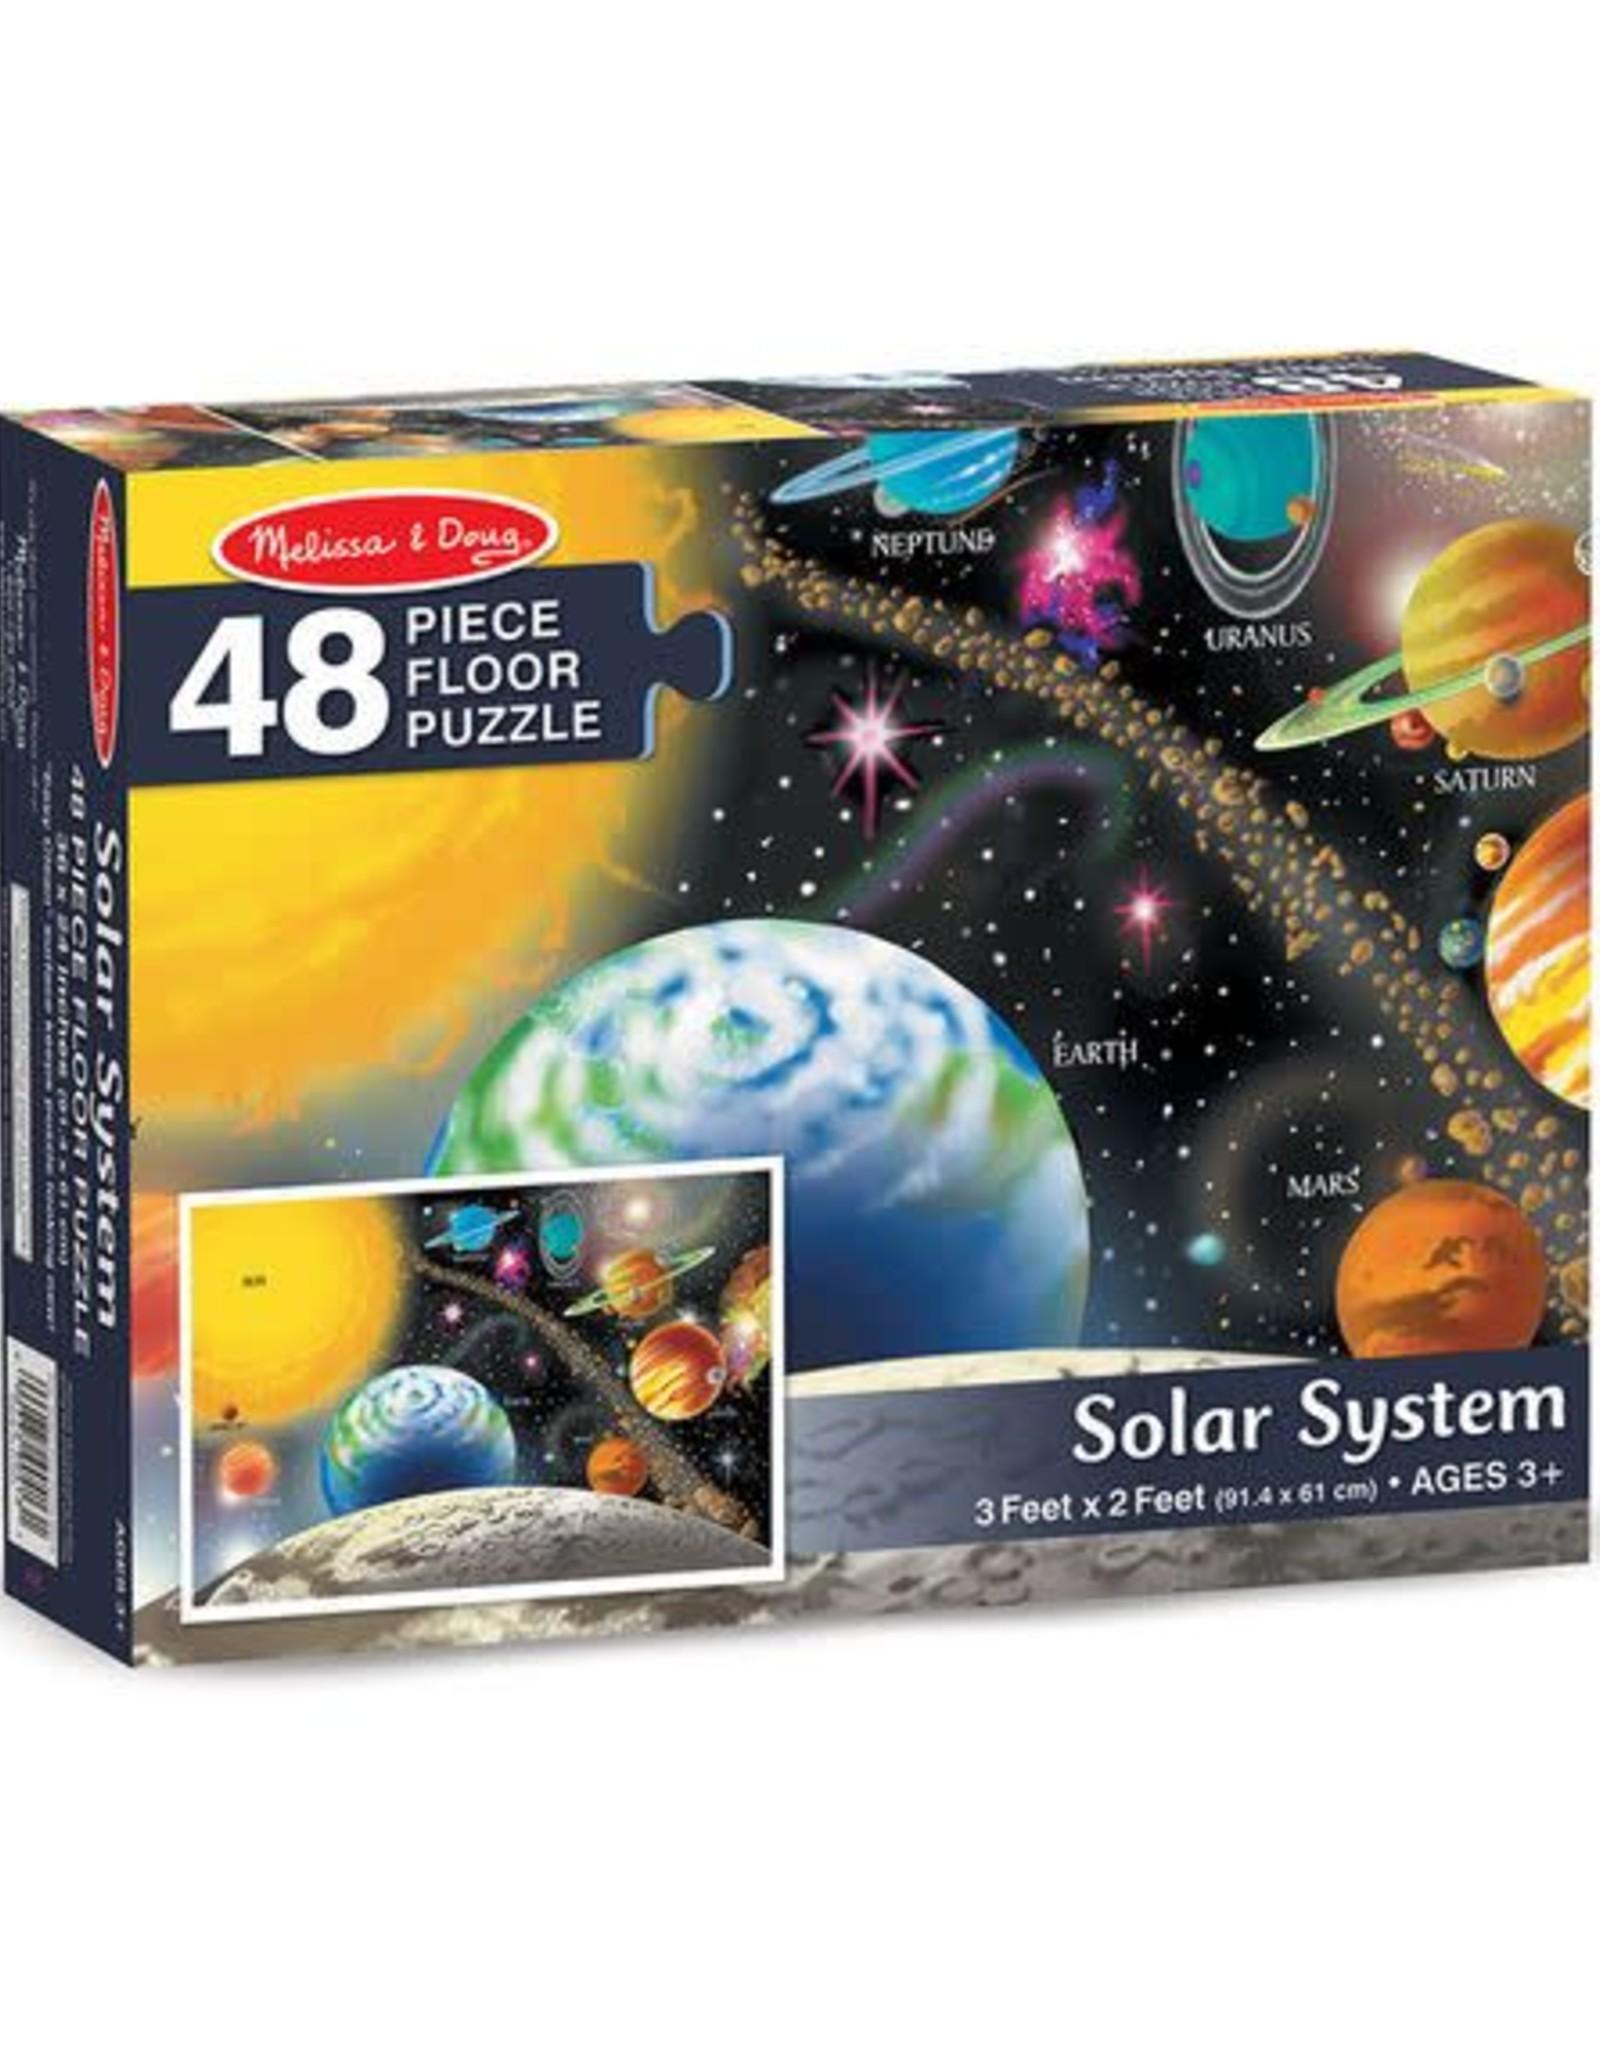 Melissa & Doug Solar System 48pc Floor Puzzle